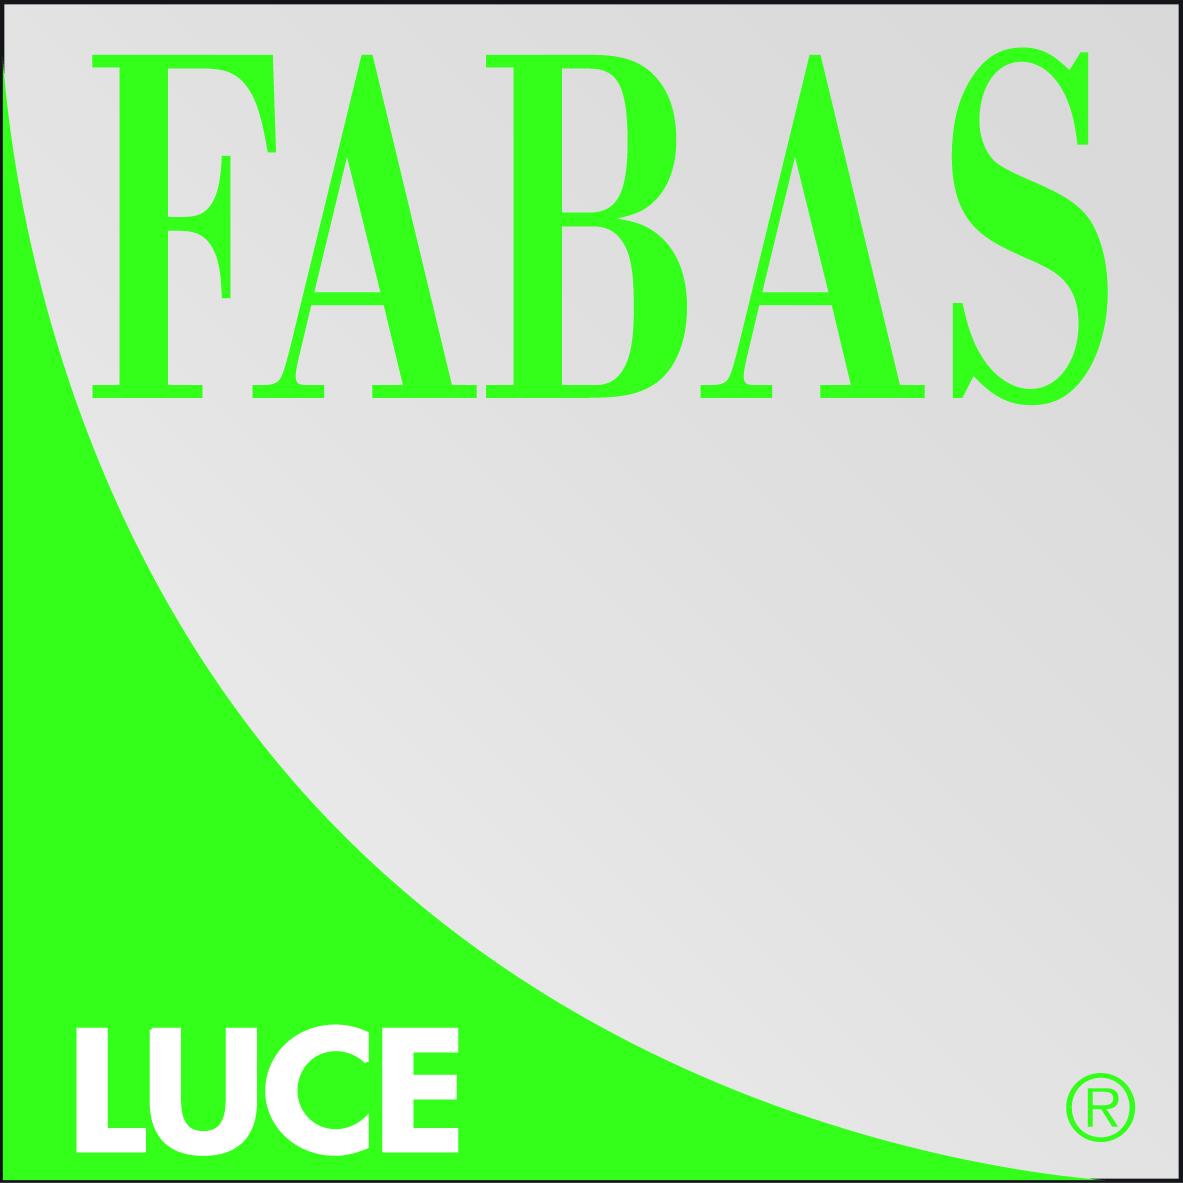 LogoFabas-300dpiJOY5sJXsel16l